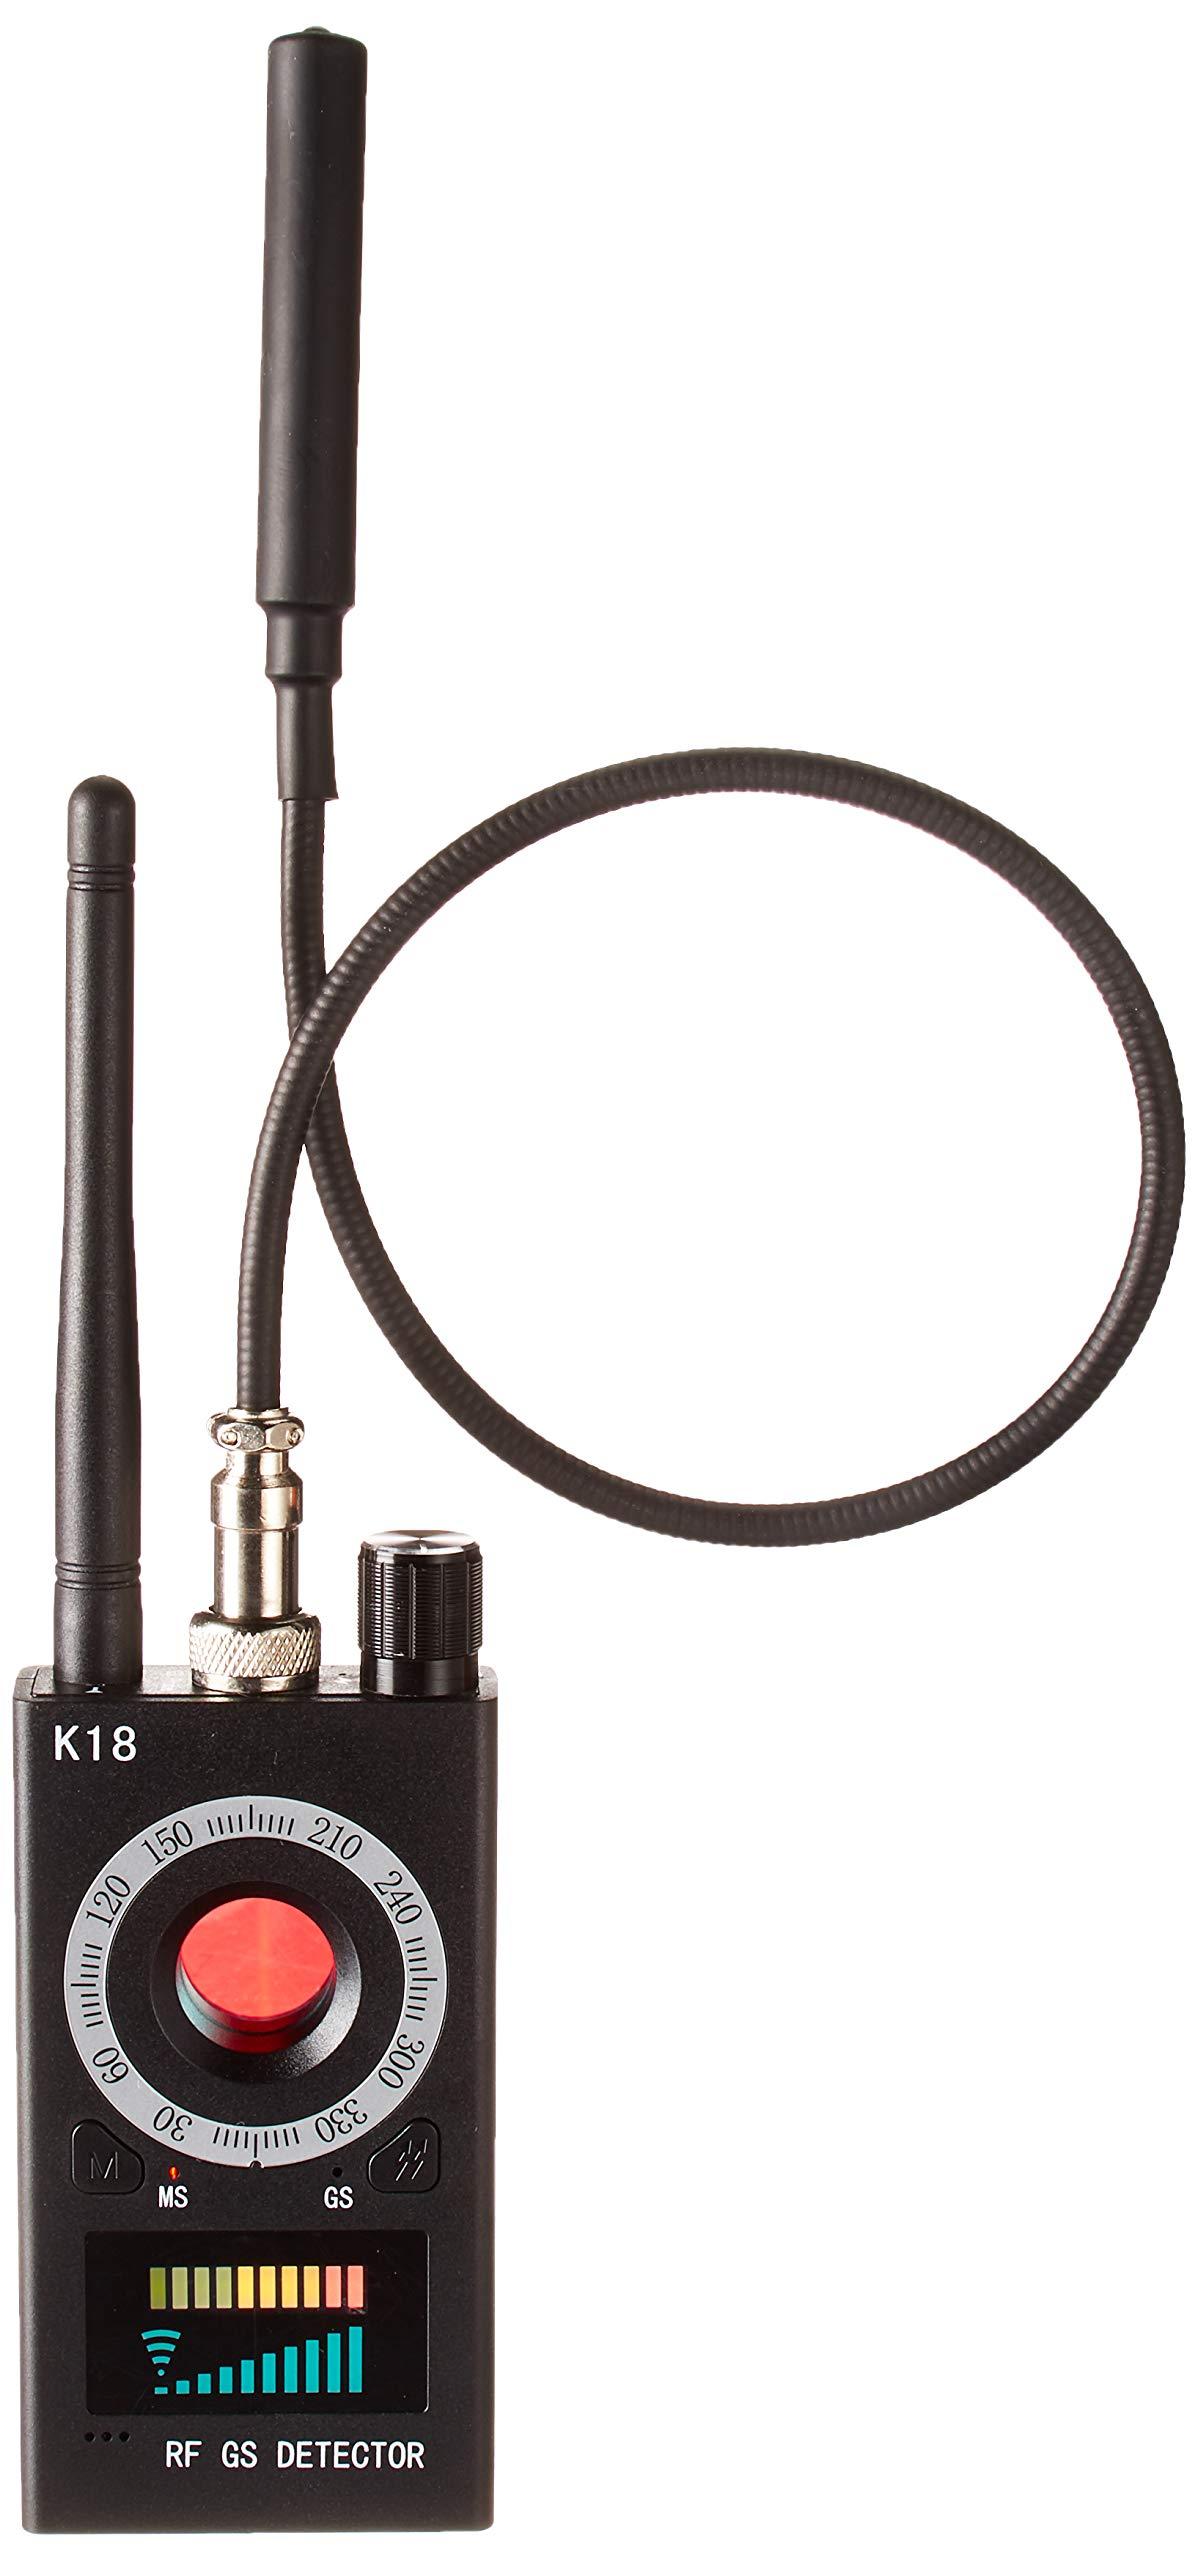 Anti Spy Camera Detector, Rf Signal Bug Detector, Wireless Signal Pinhole Laser Lens, GSM Listening Device Finder Radar Radio Scanner Wireless Signal Alarm by Miebul